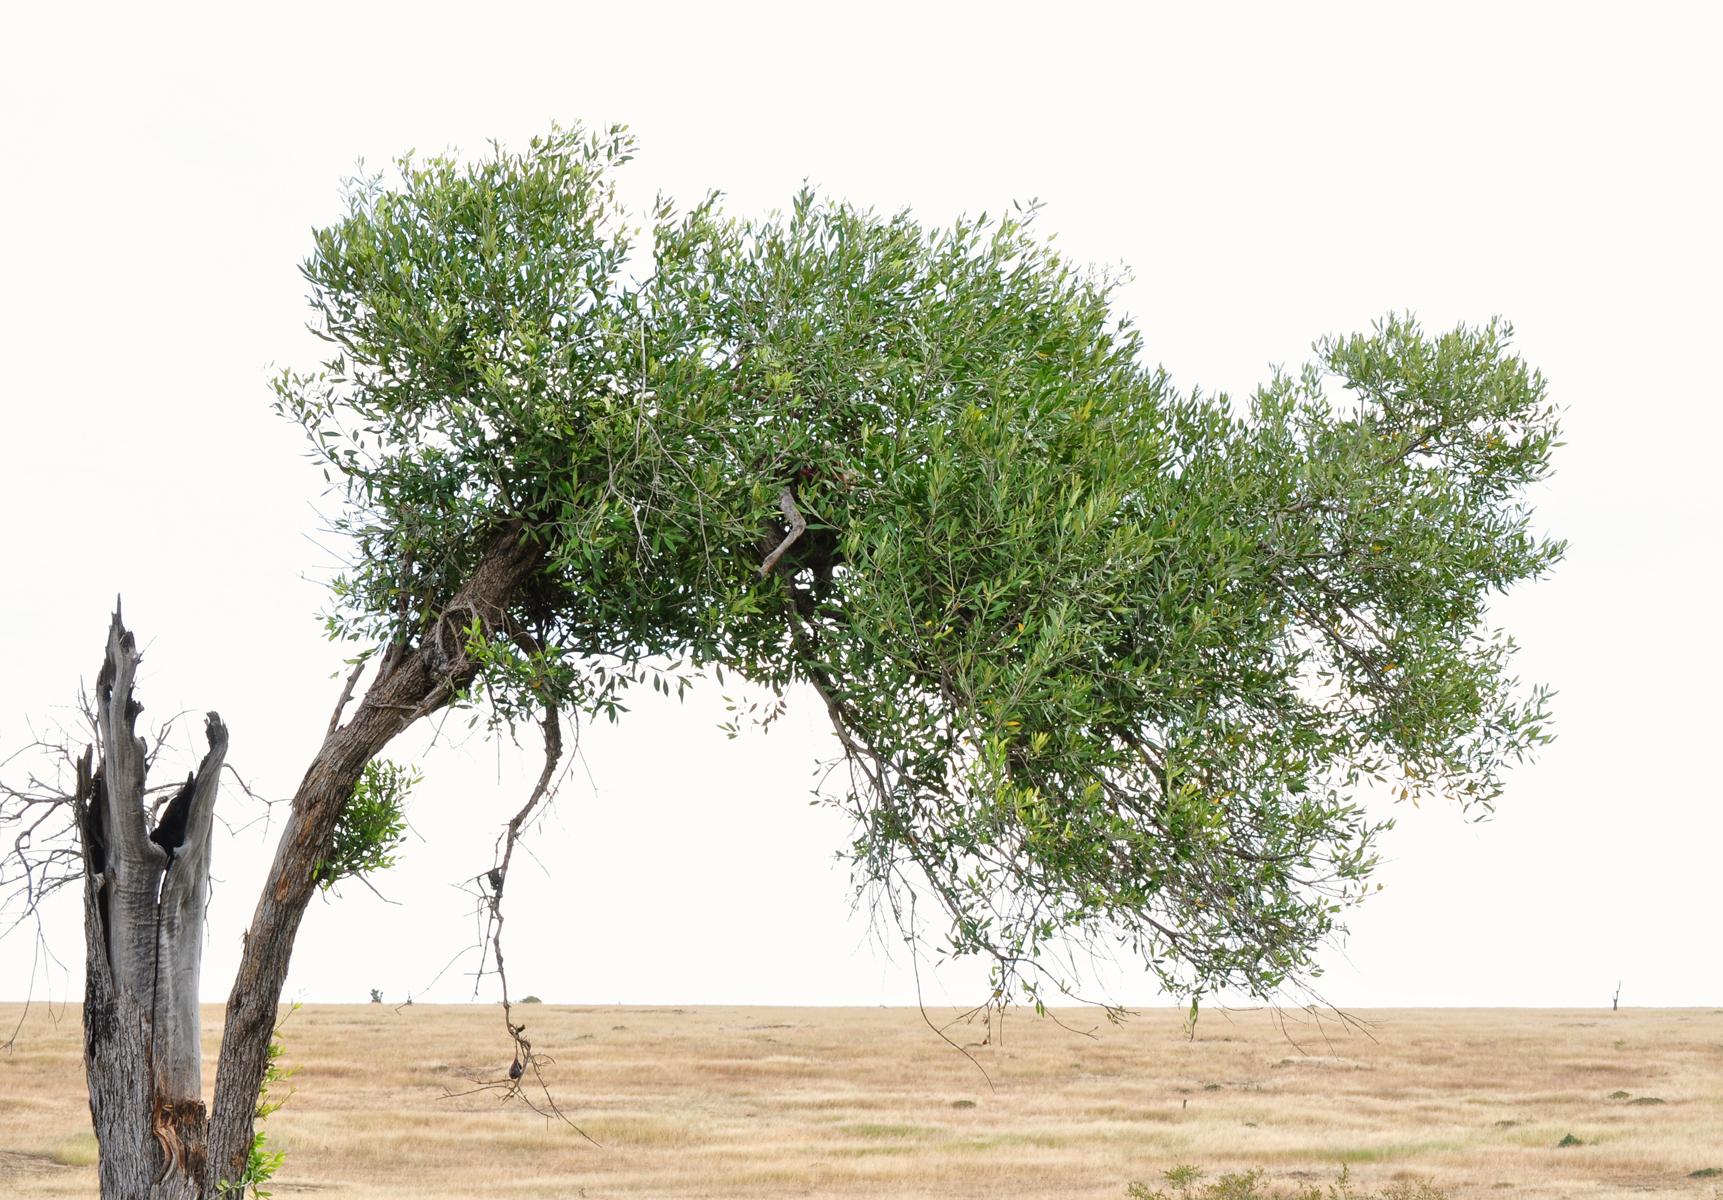 Kenya Tree 0235